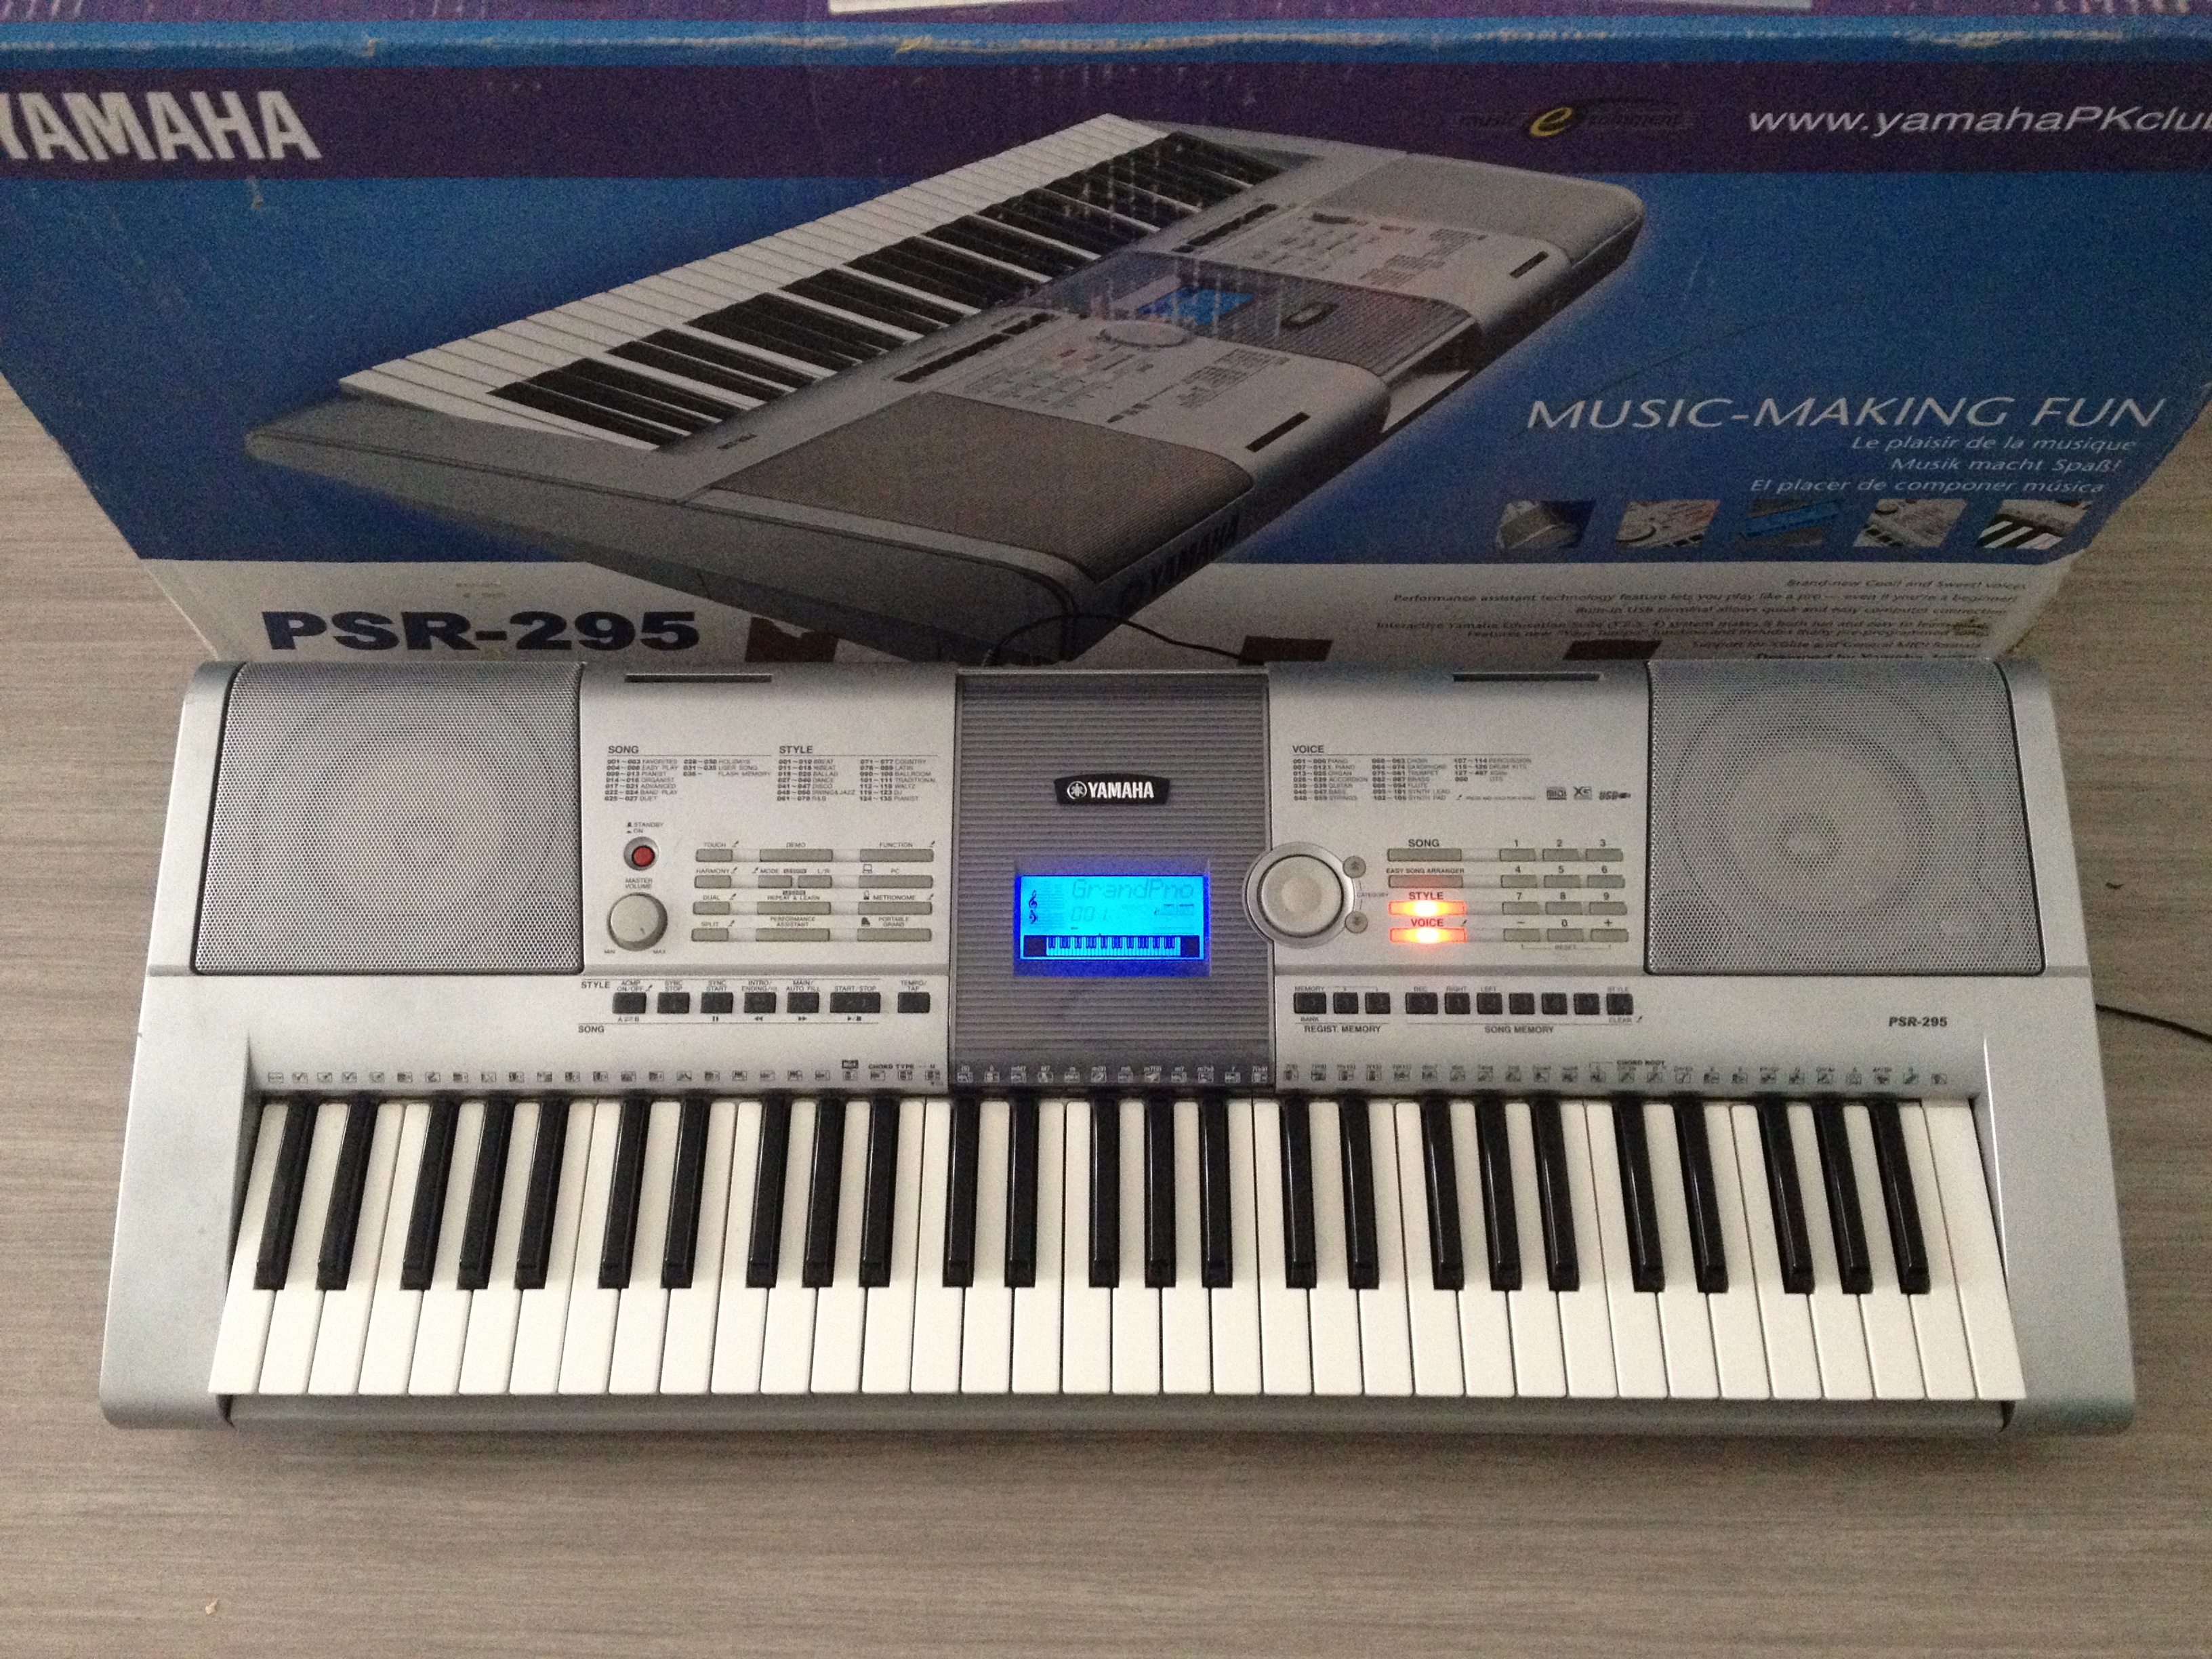 Yamaha psr 295 image 1704775 audiofanzine for Yamaha clp 295